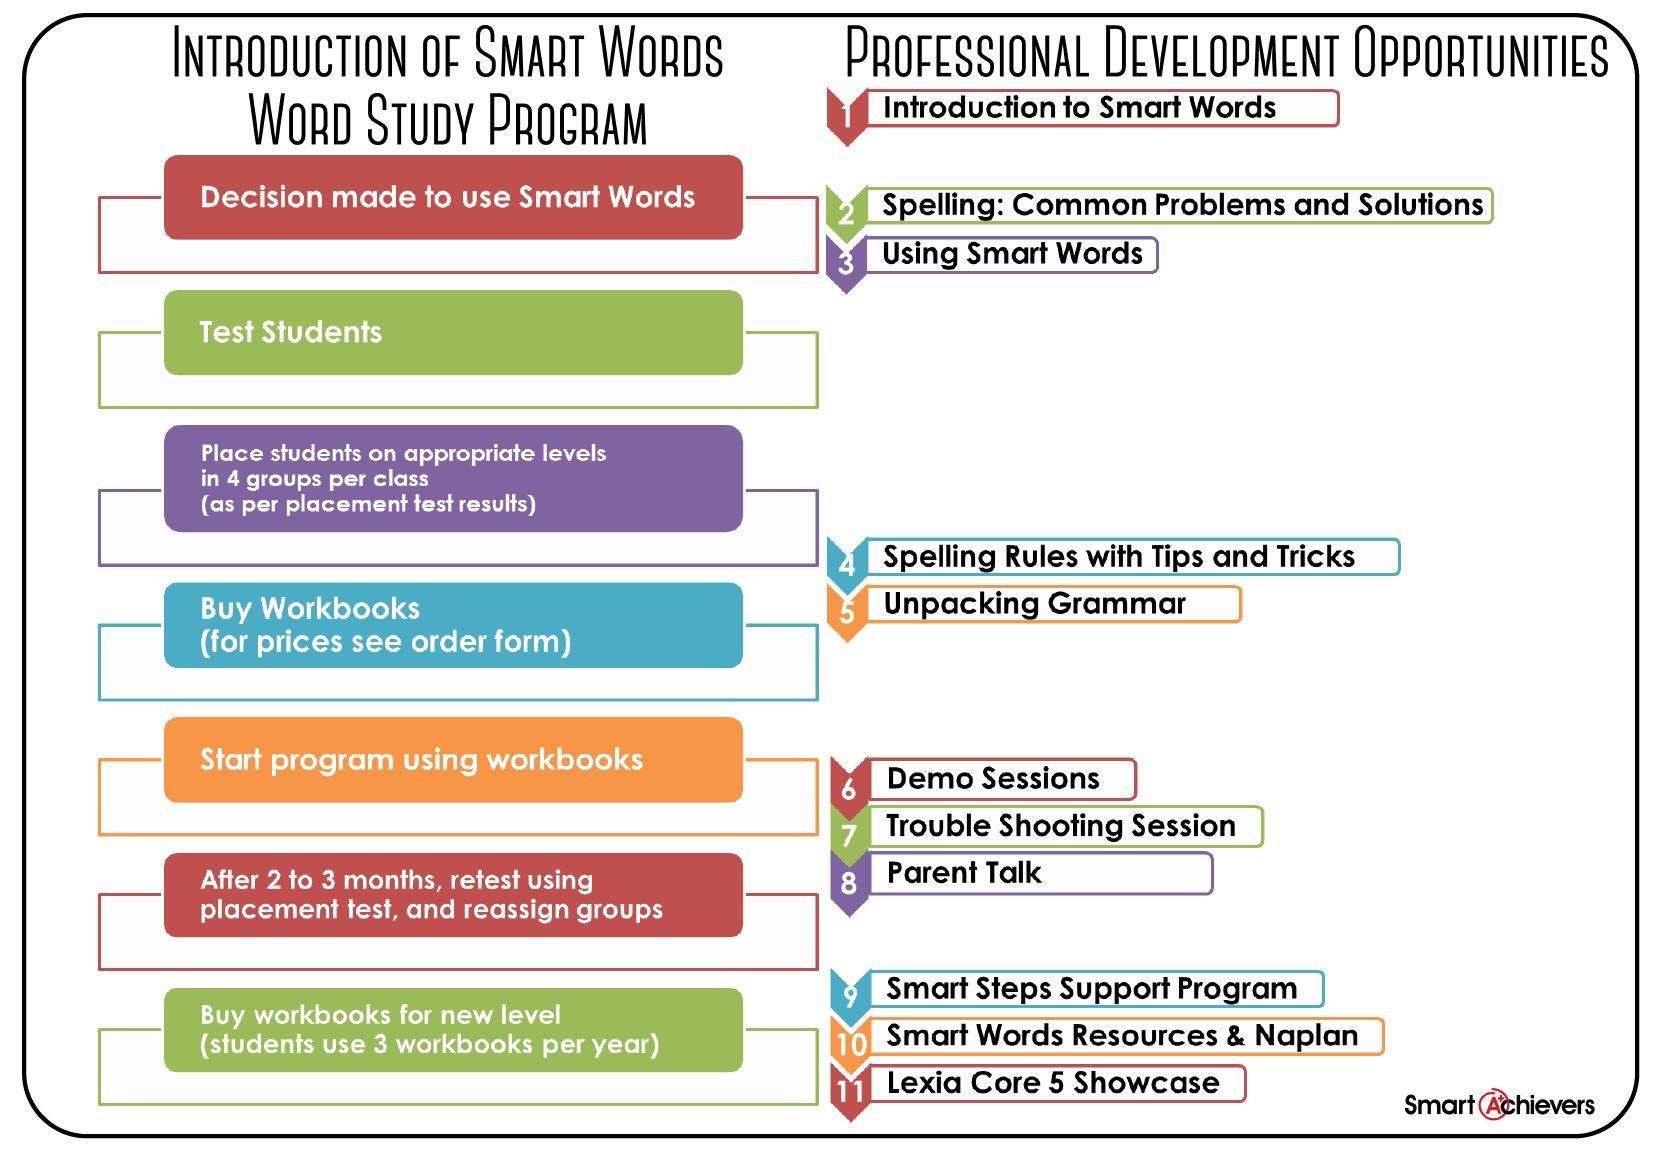 SMART WORDS ~ Smart Achievers